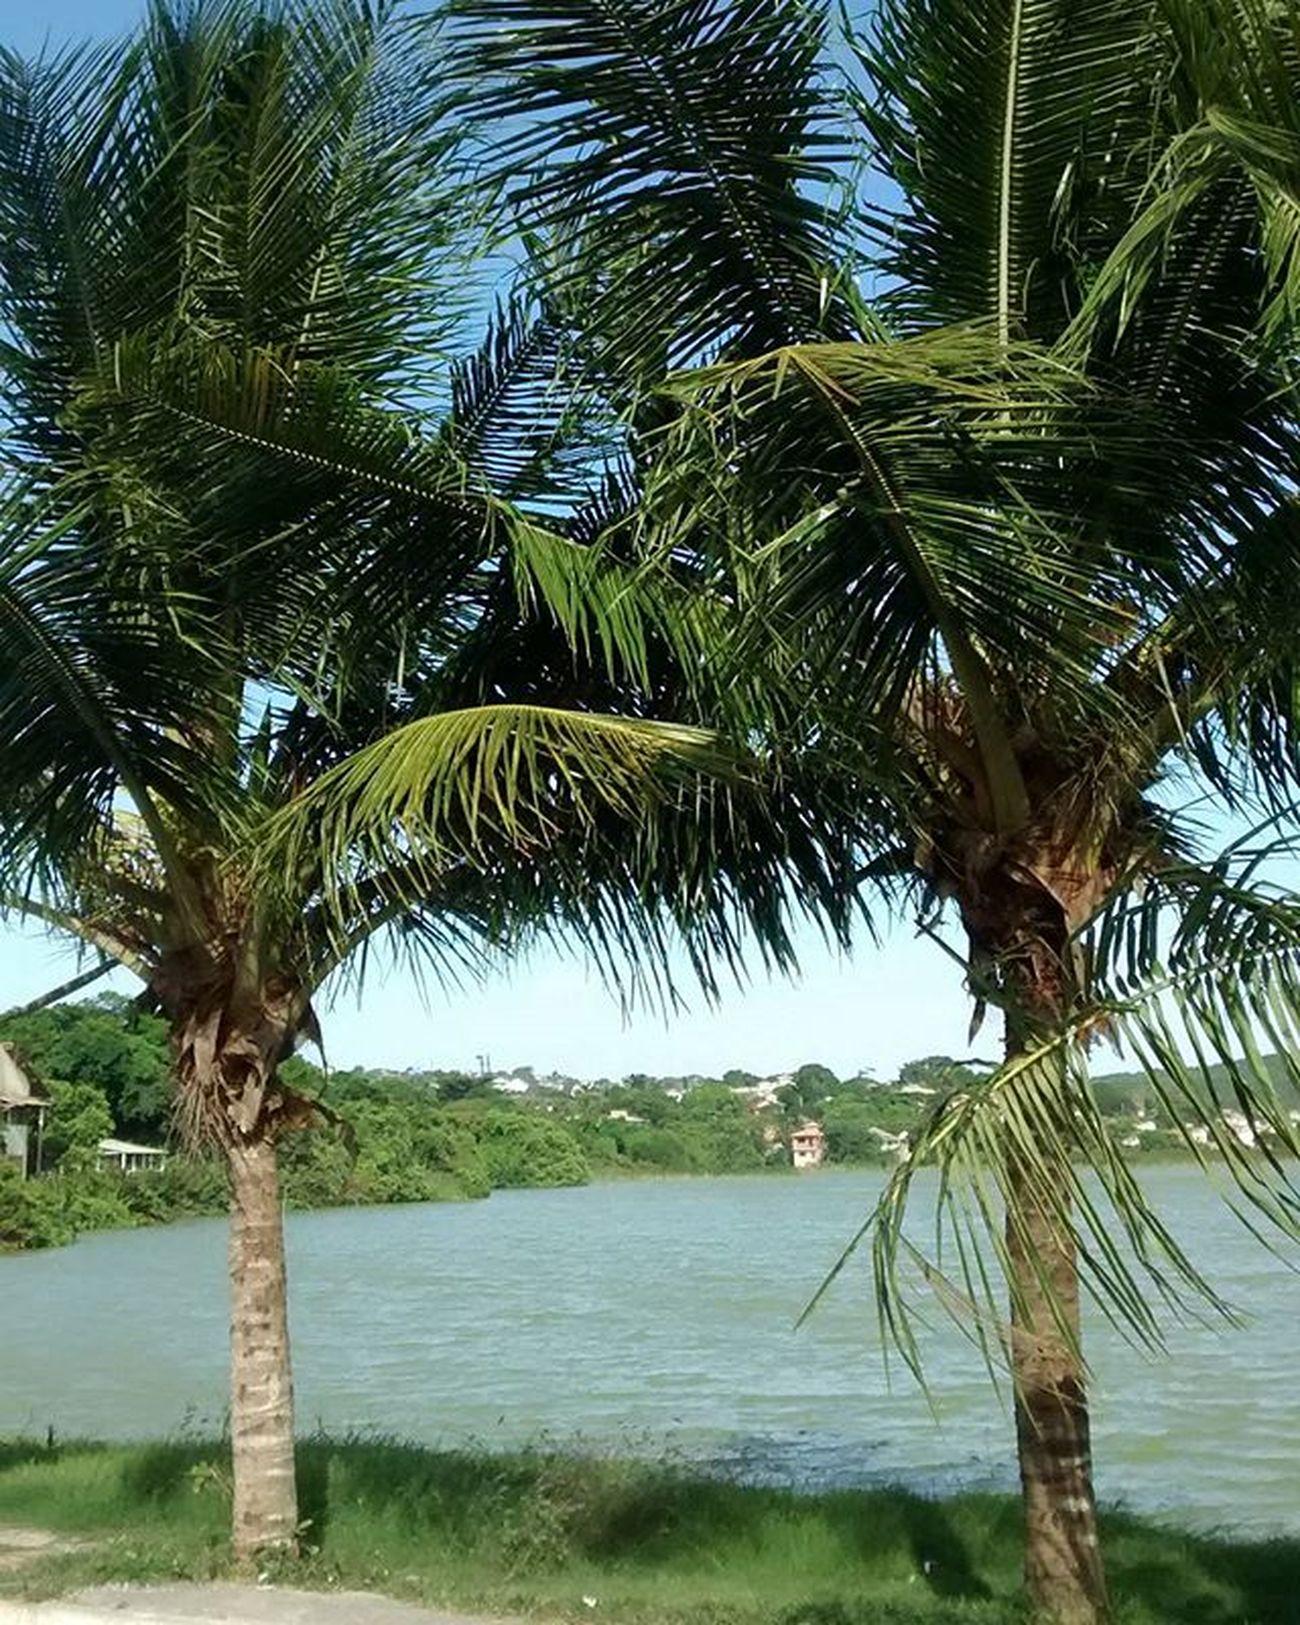 Palmeiras Palmeras Palme Palmtrees Lagoa Pond Stagno Estanque Geriba Semfiltro Buzios Buziosrj Riodejaneiro Rj40graus Errejota  Brasil Brazil